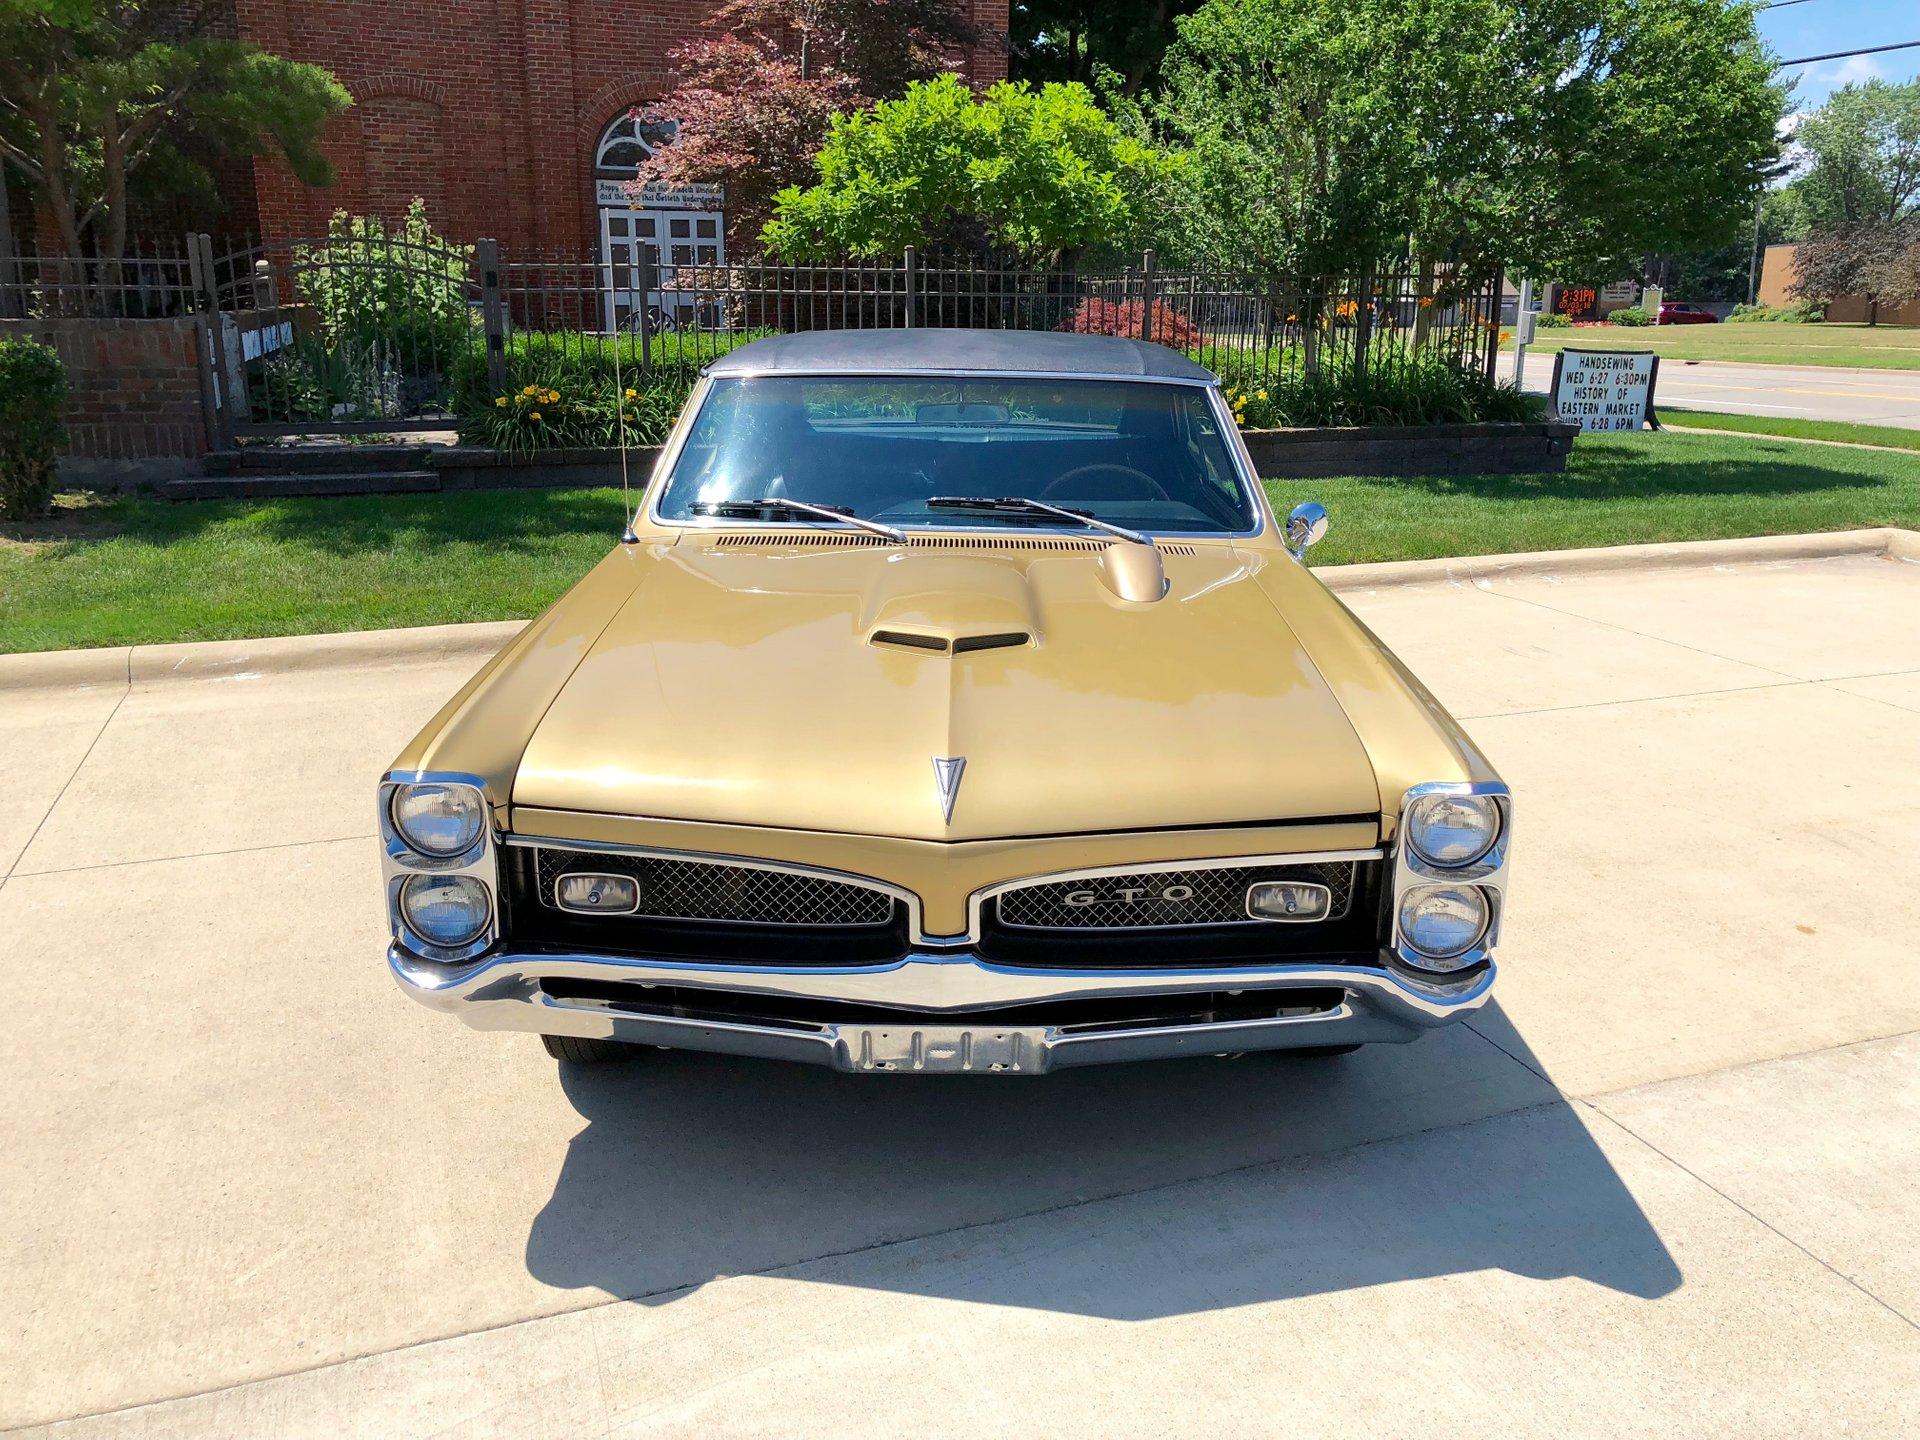 1967 Pontiac GTO | Showdown Auto Sales - Drive Your Dream